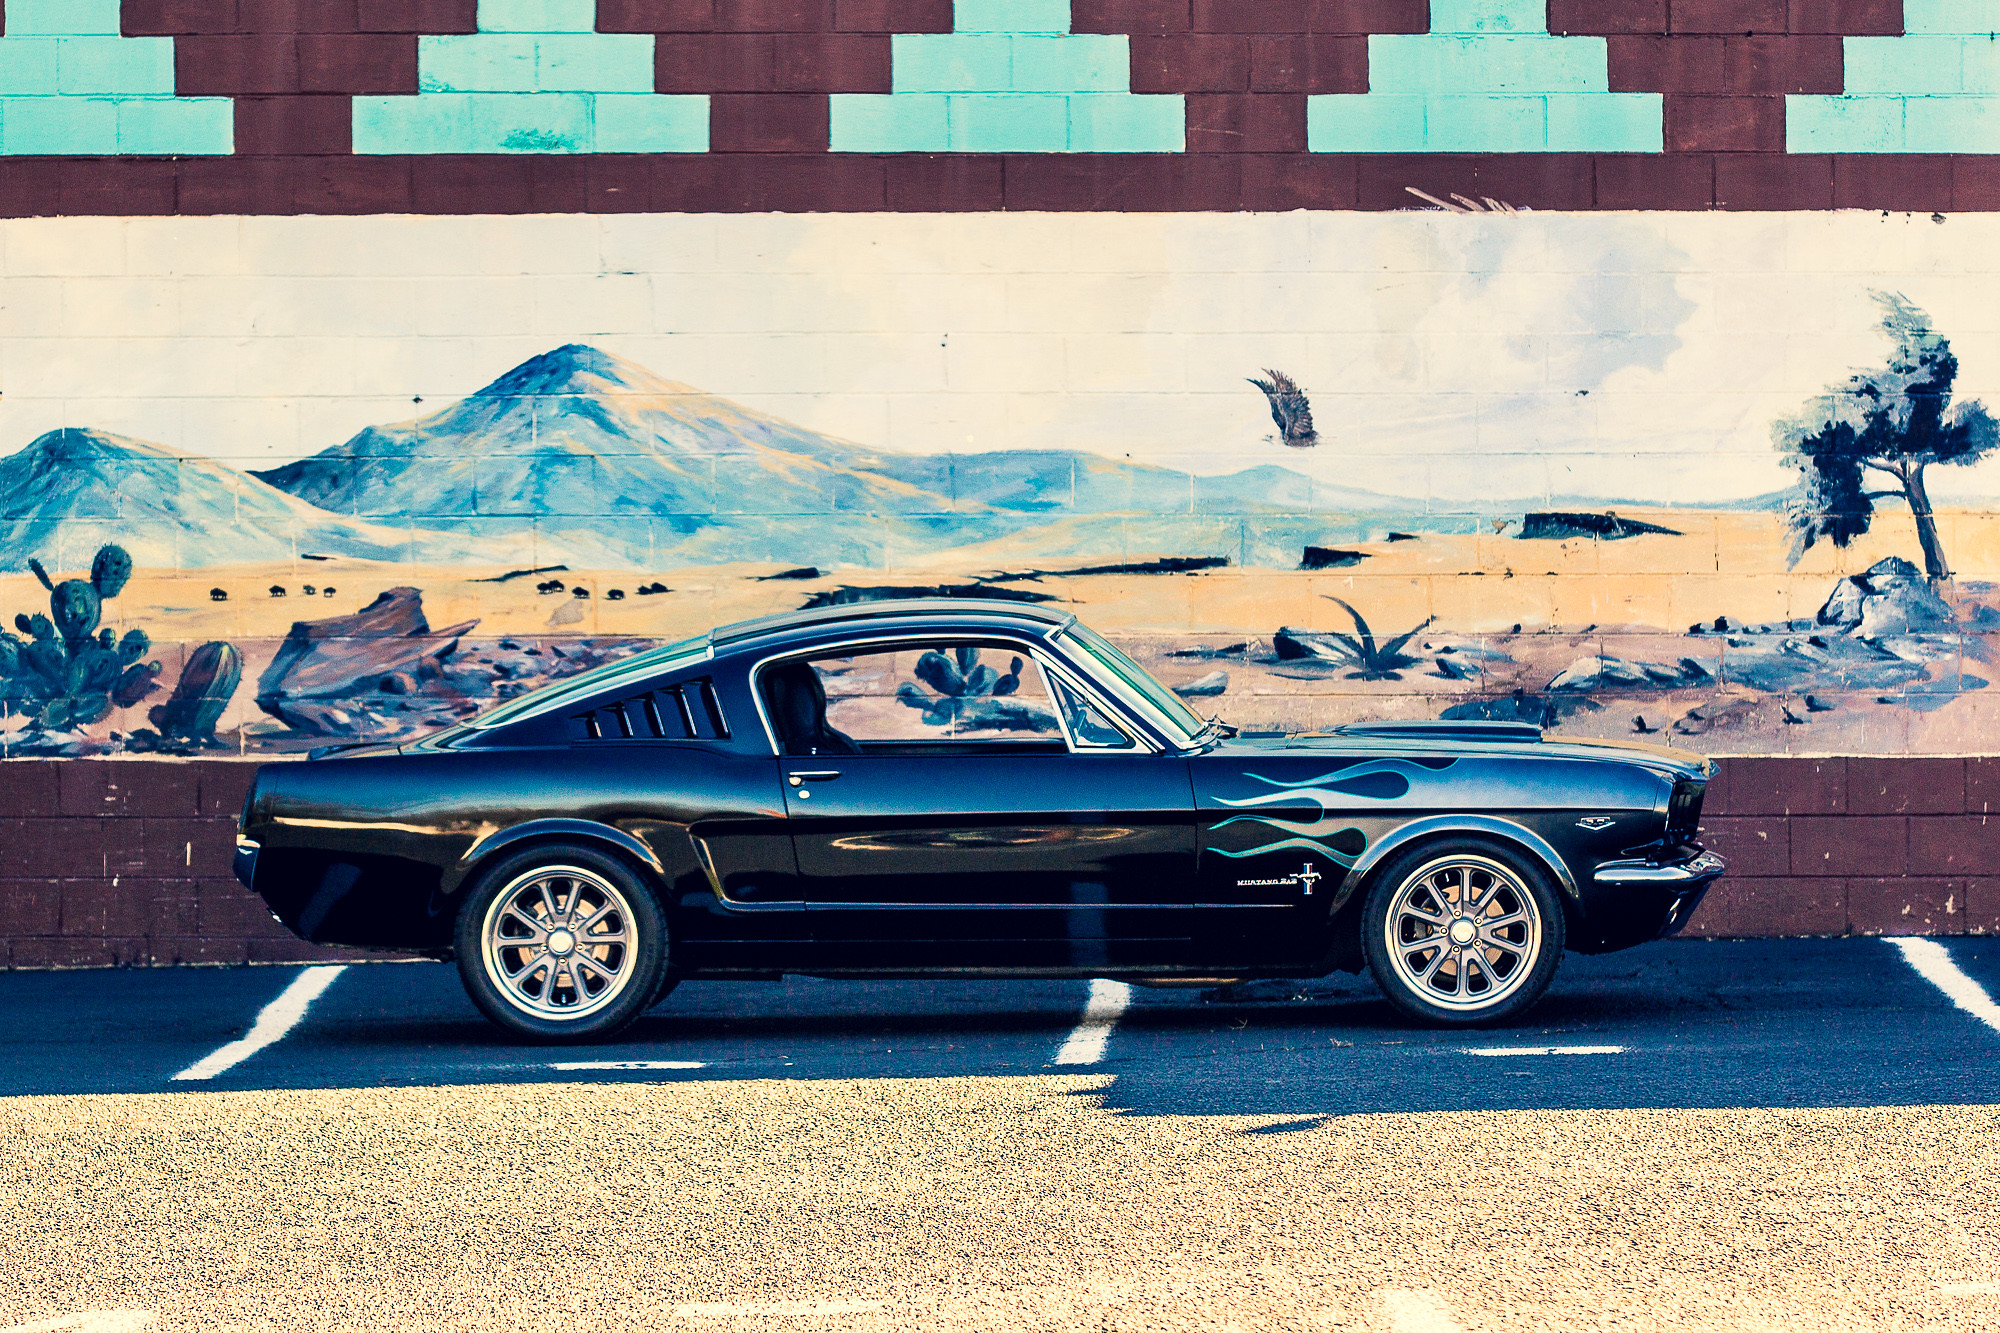 1968 Mustang 17 Inch Wheels